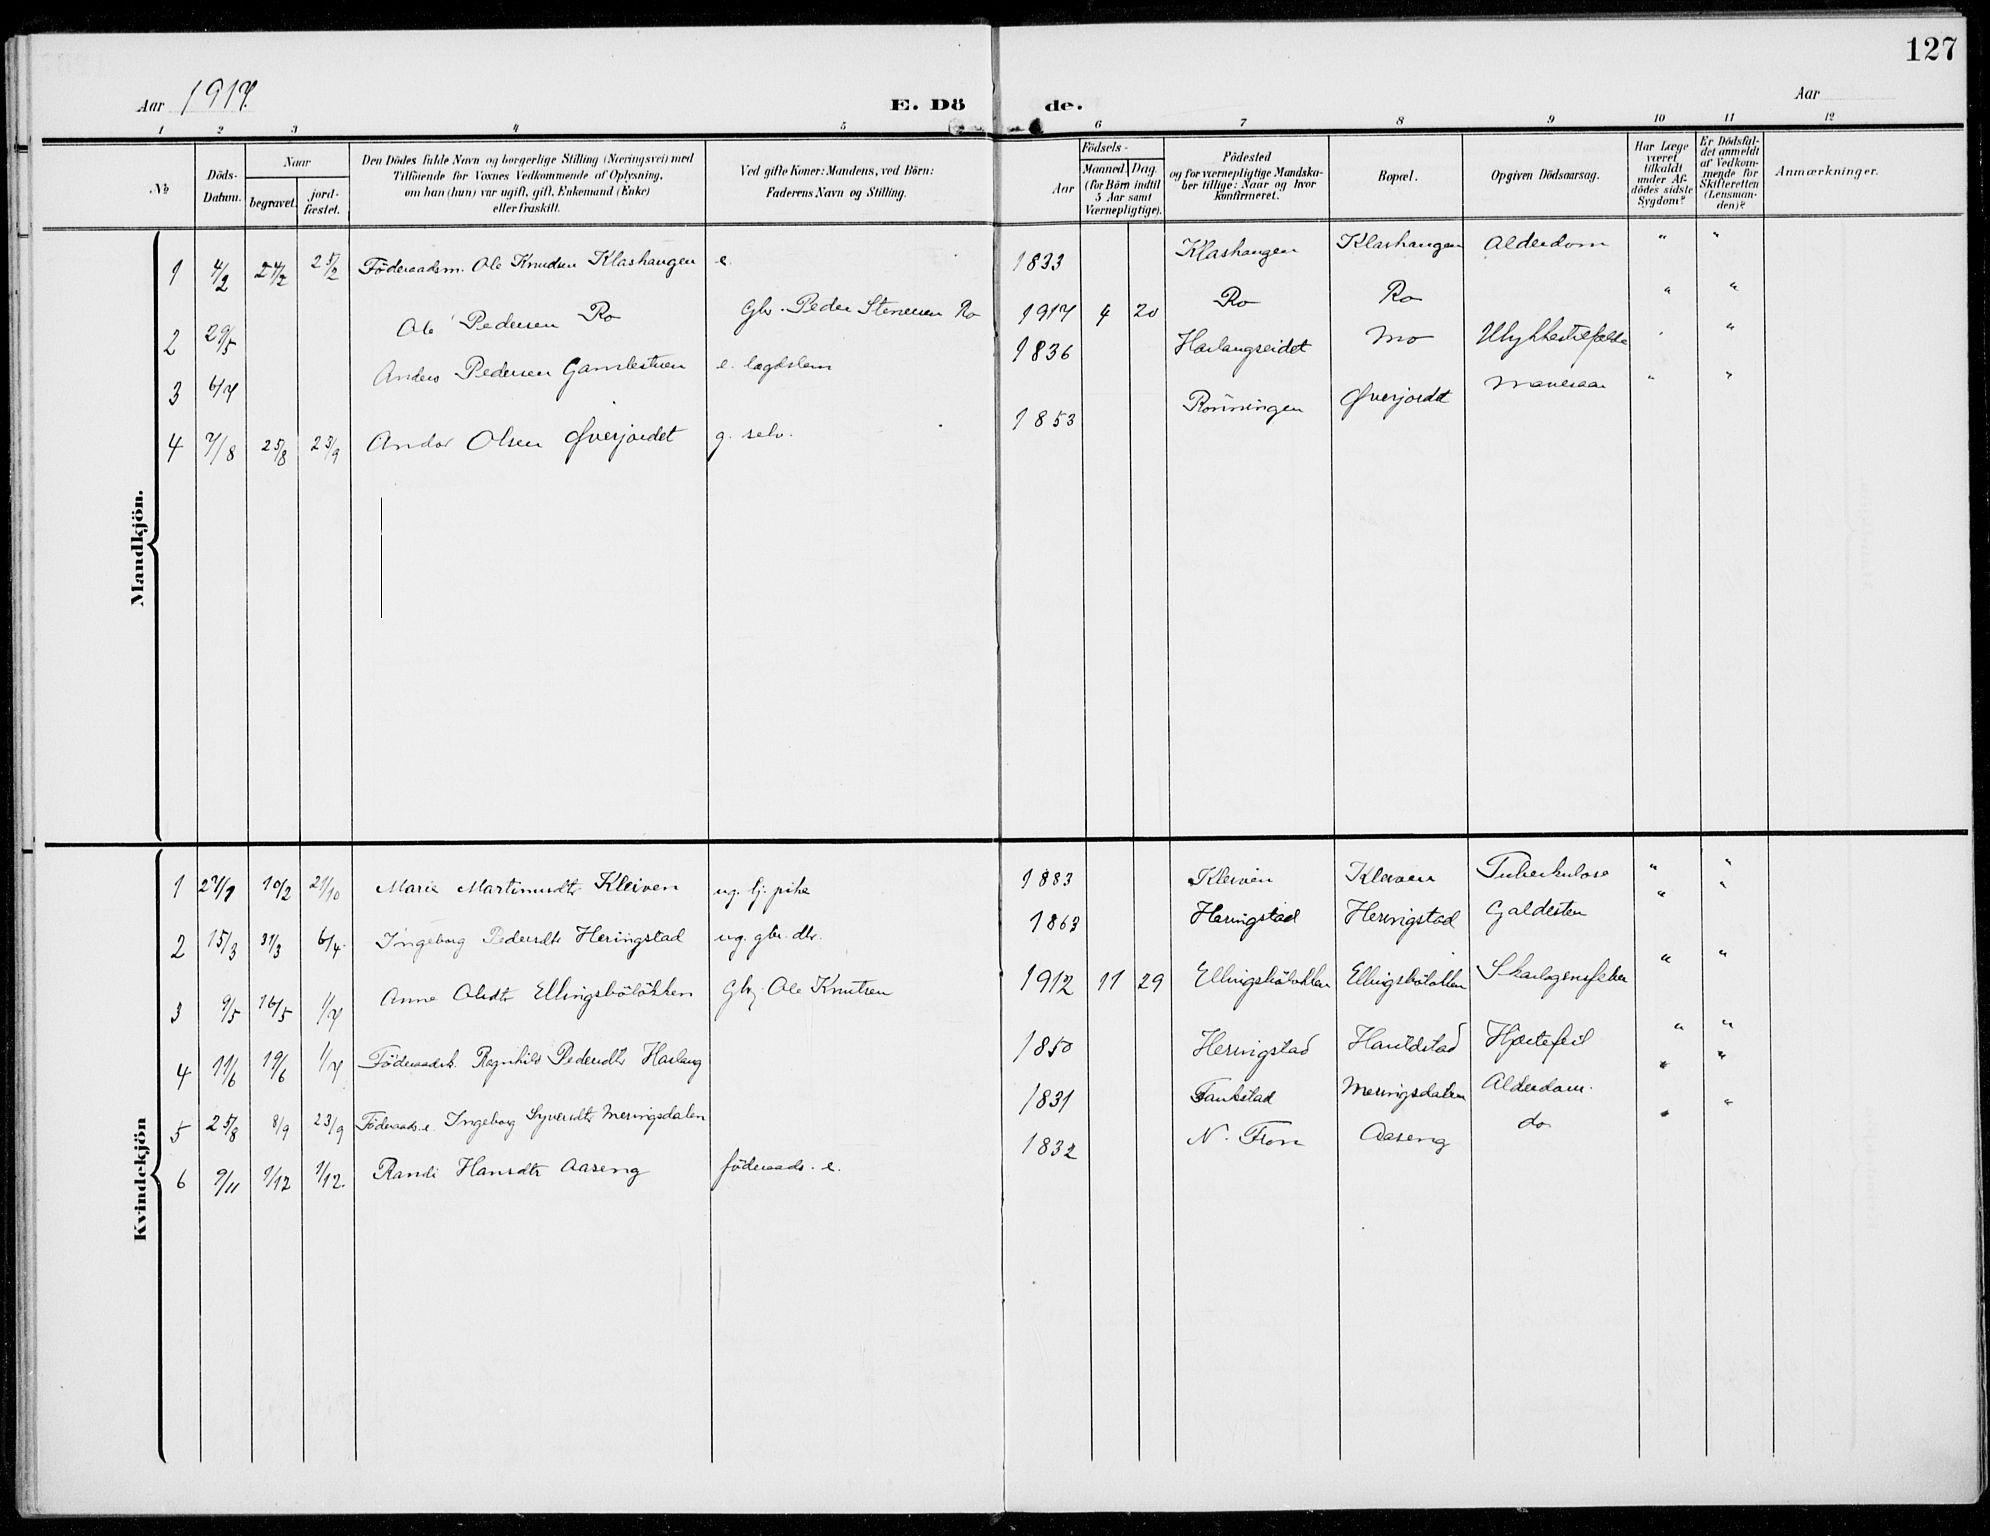 SAH, Sel prestekontor, Parish register (official) no. 1, 1905-1922, p. 127